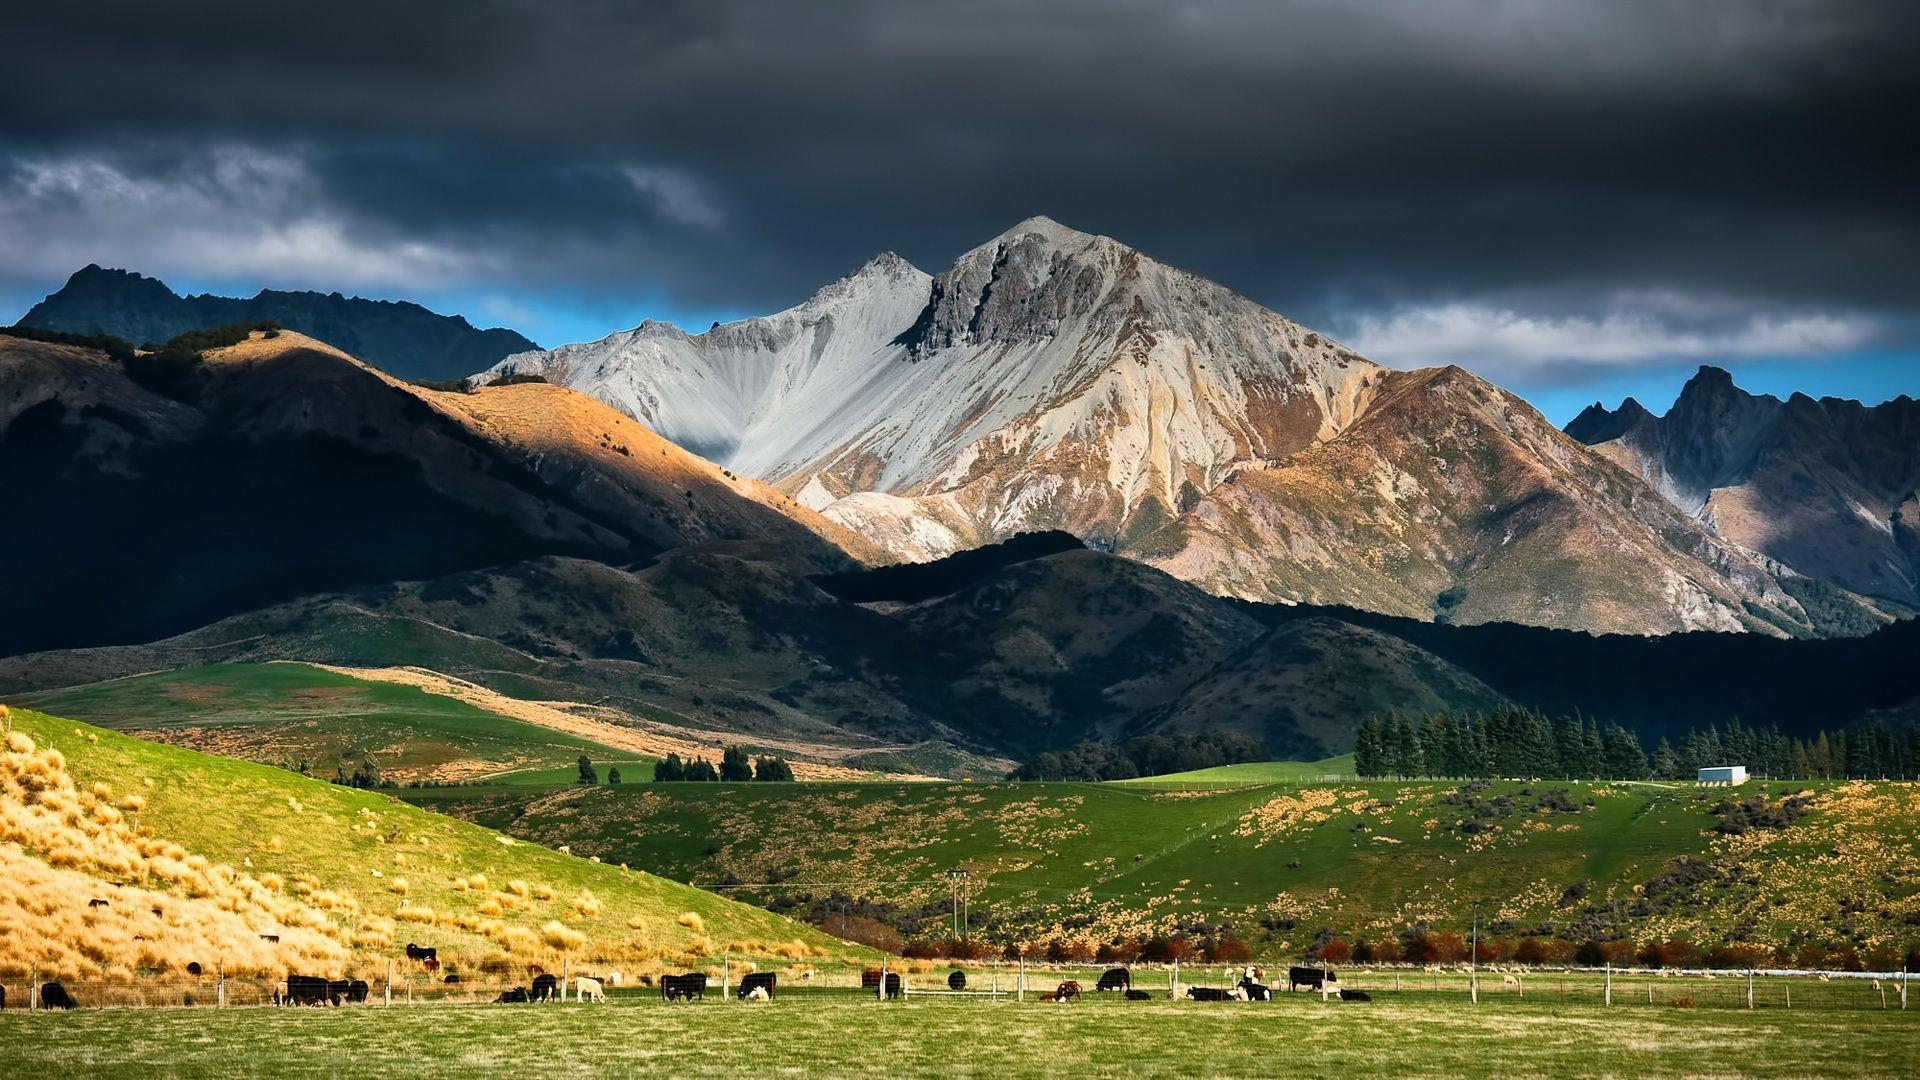 Stunning New Zealand Landscape Wallpaper Iphone 1920x1080px